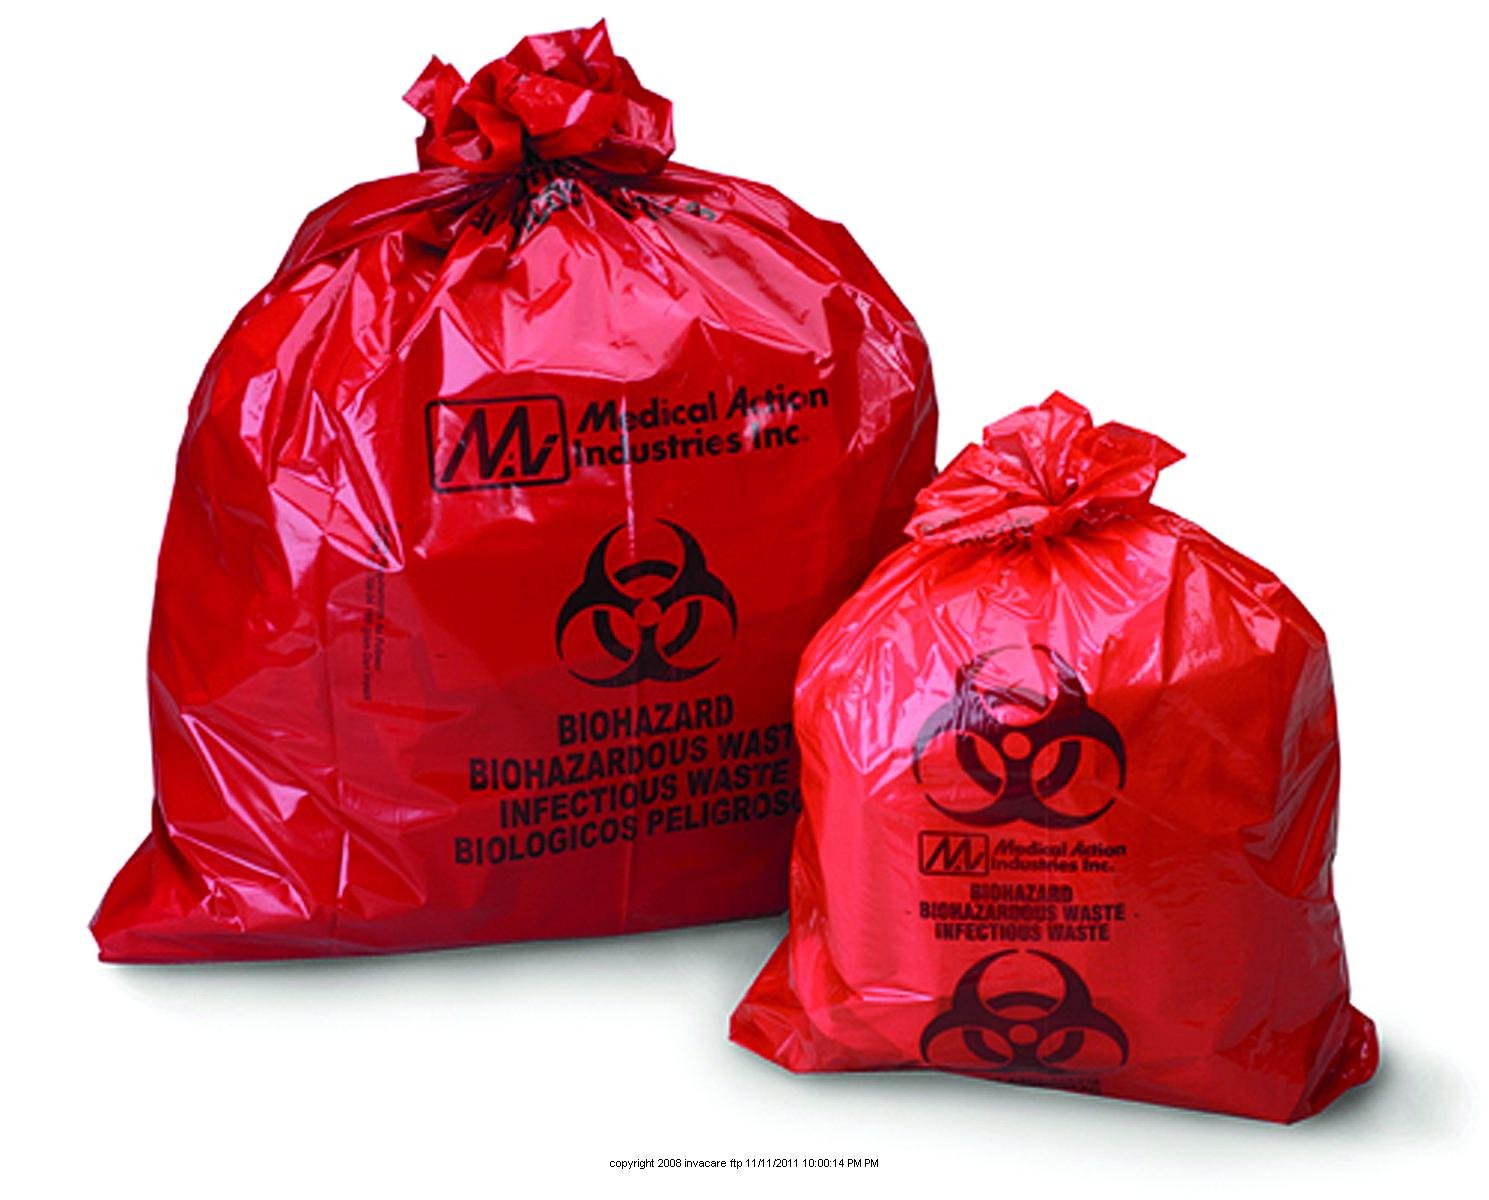 Biohazard Waste Bag WST 23X23 10 1 CASE Gal 4 years Time sale warranty 50